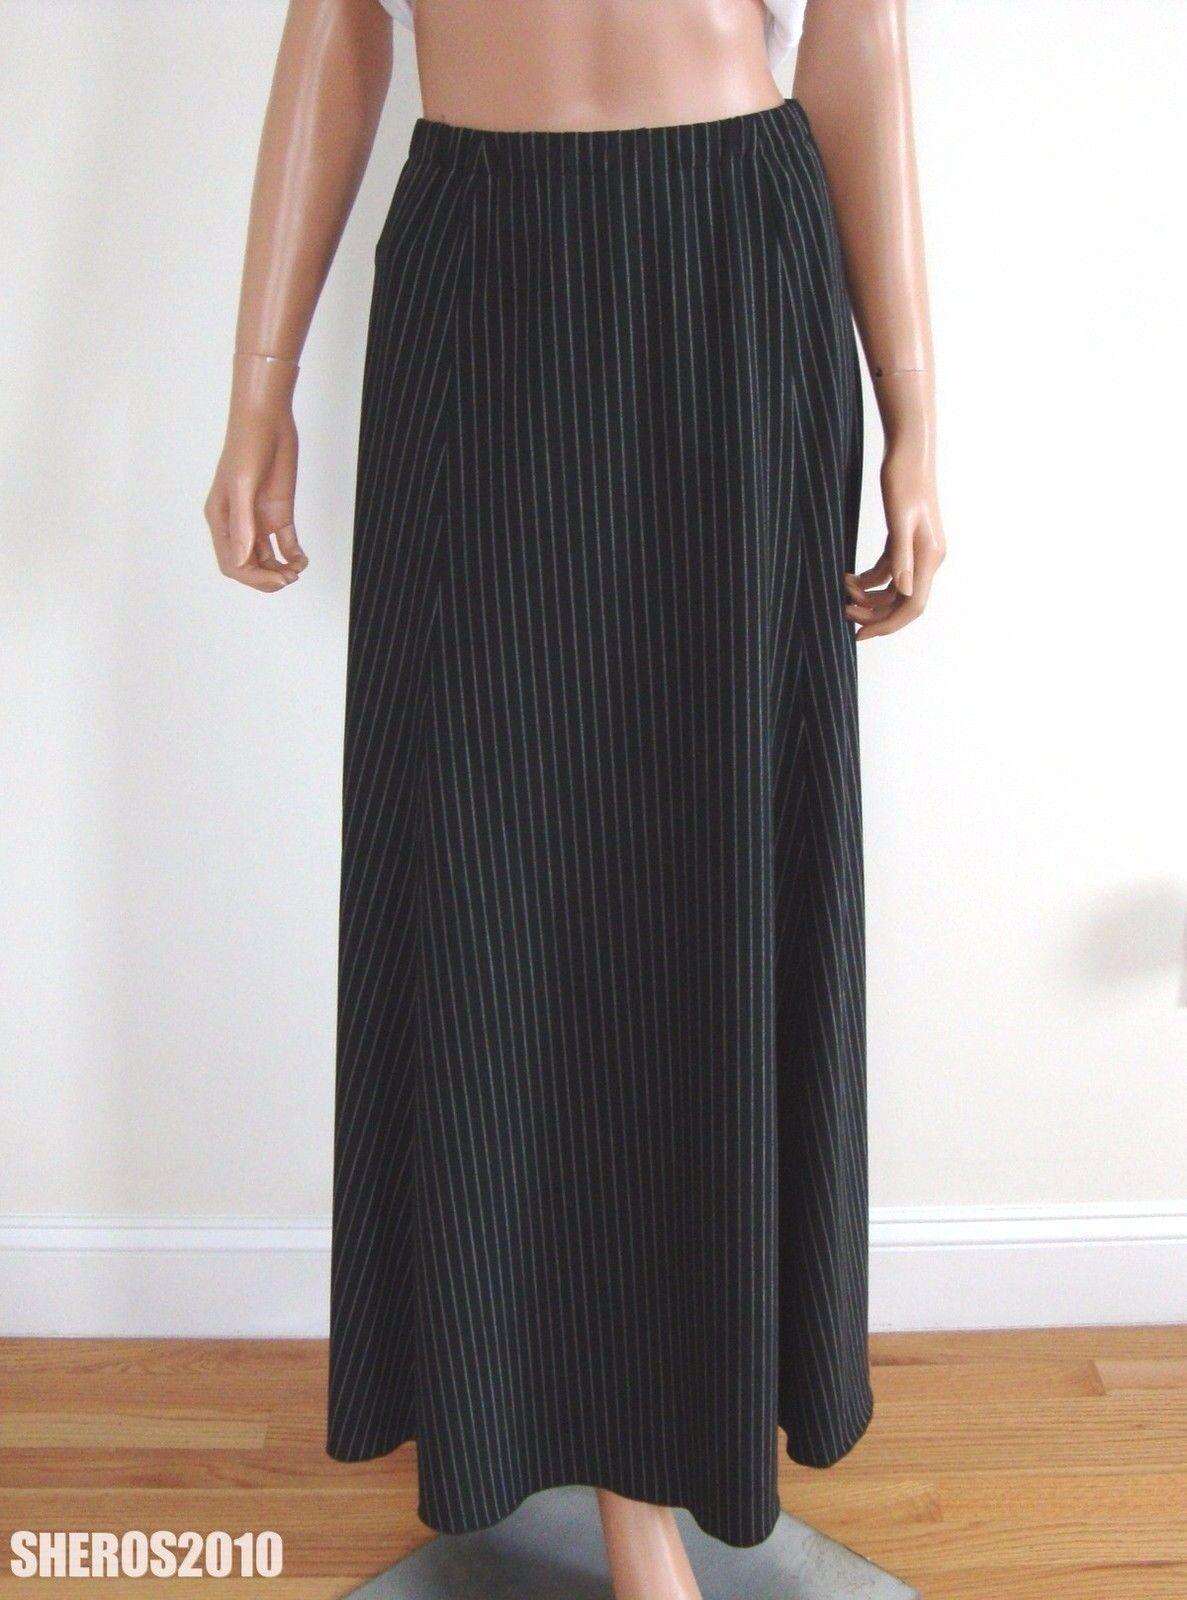 1450 Authentic Lgold PIANA WOOL Blend Striped Long MAXI Skirt IT-40 W-26-28